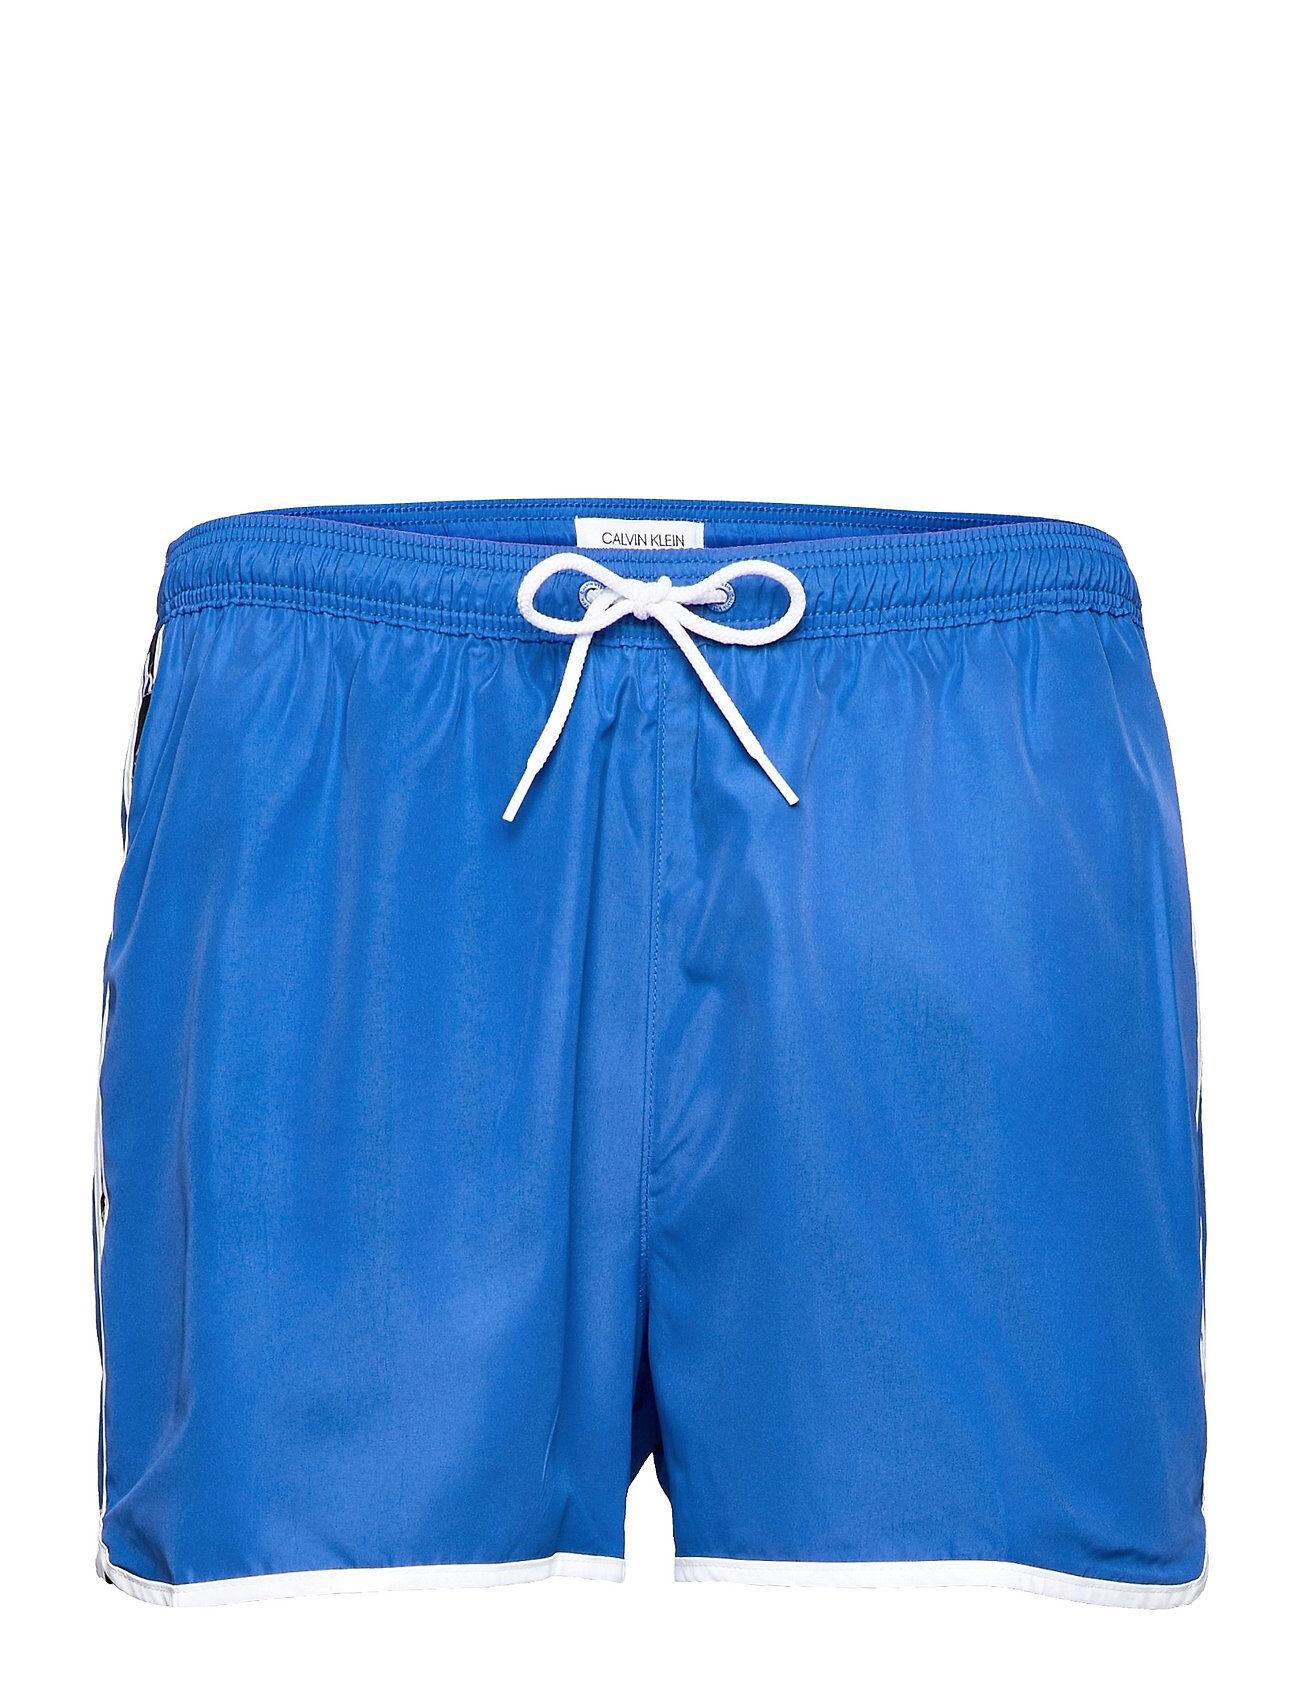 Calvin Short Runner Badeshorts Blå Calvin Klein